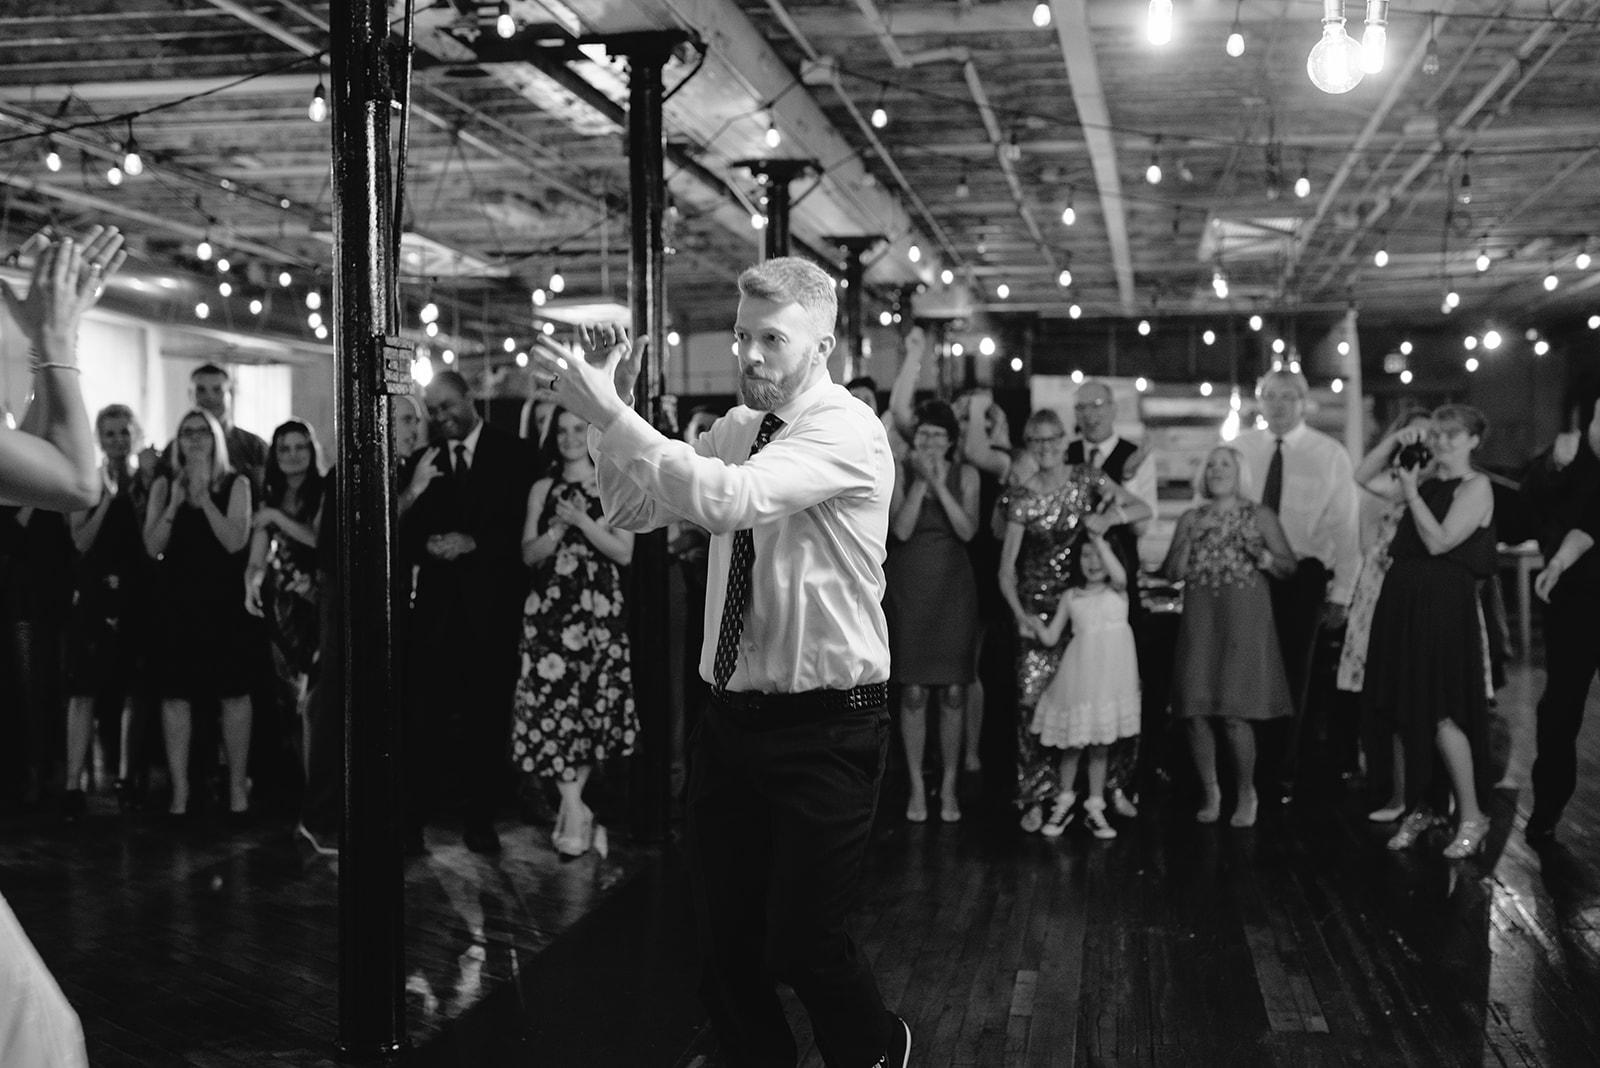 Art Factory Wedding- Industrial Chic- Audrey+Ryan- Paterson NJ- Olivia Christina Photo (57).jpg